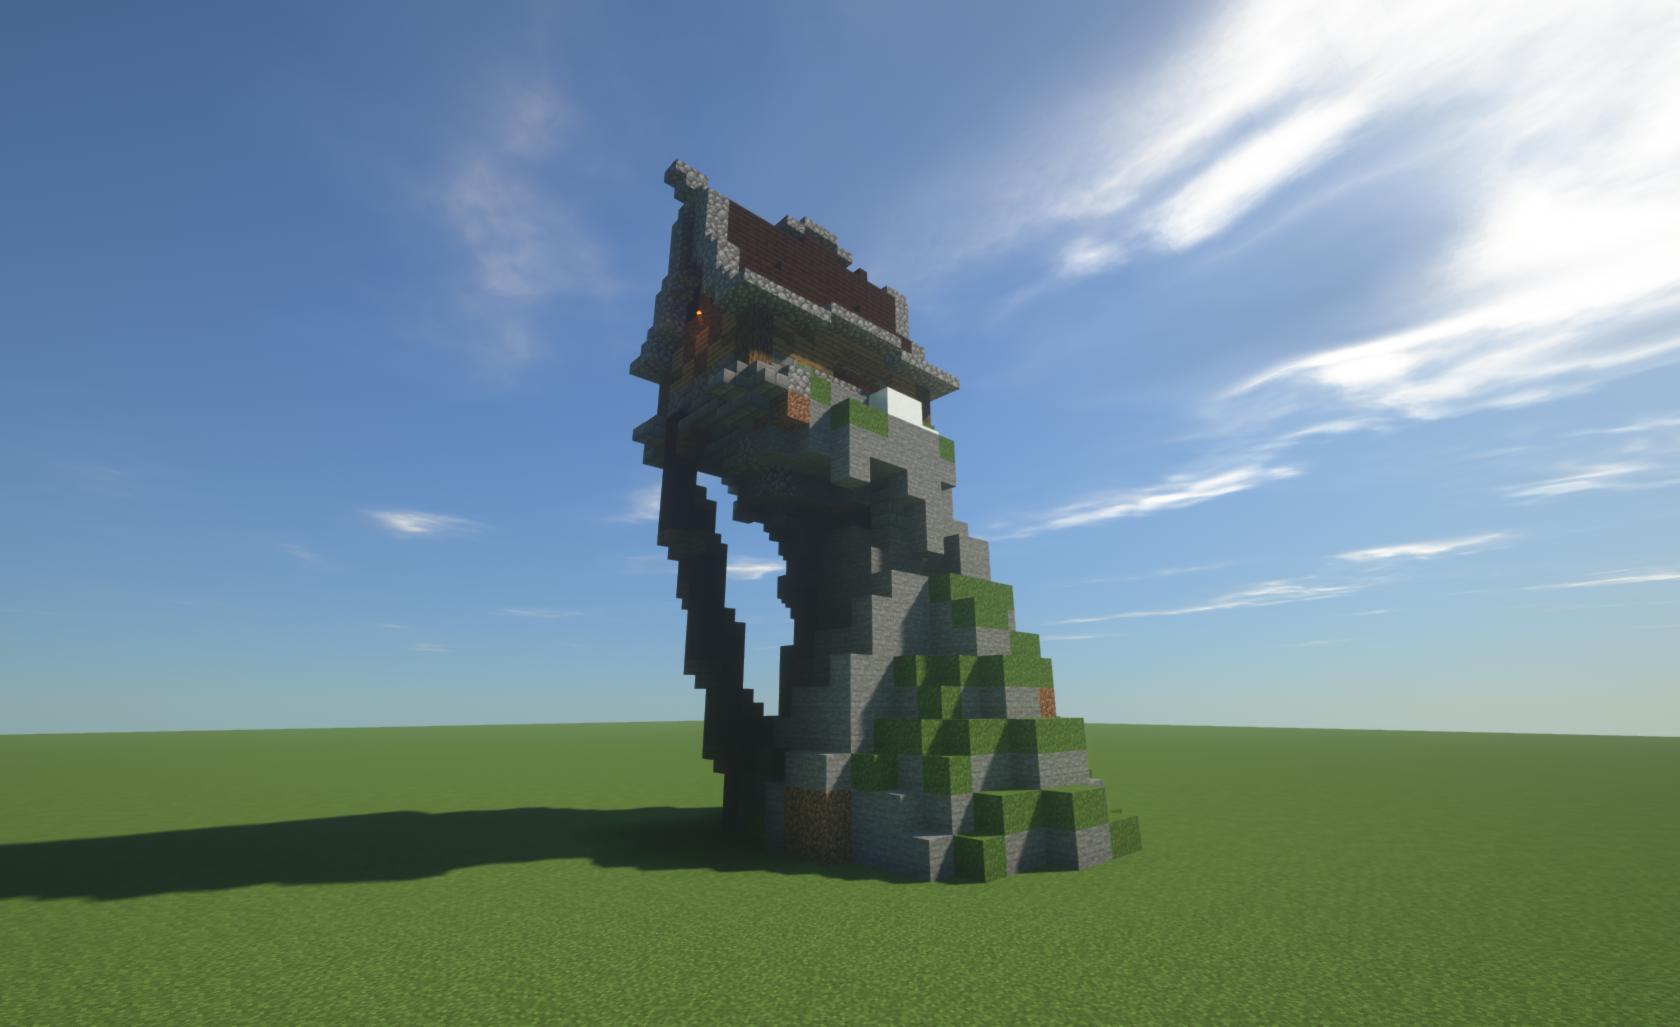 Cliffside Mountain Home Minecraft Map